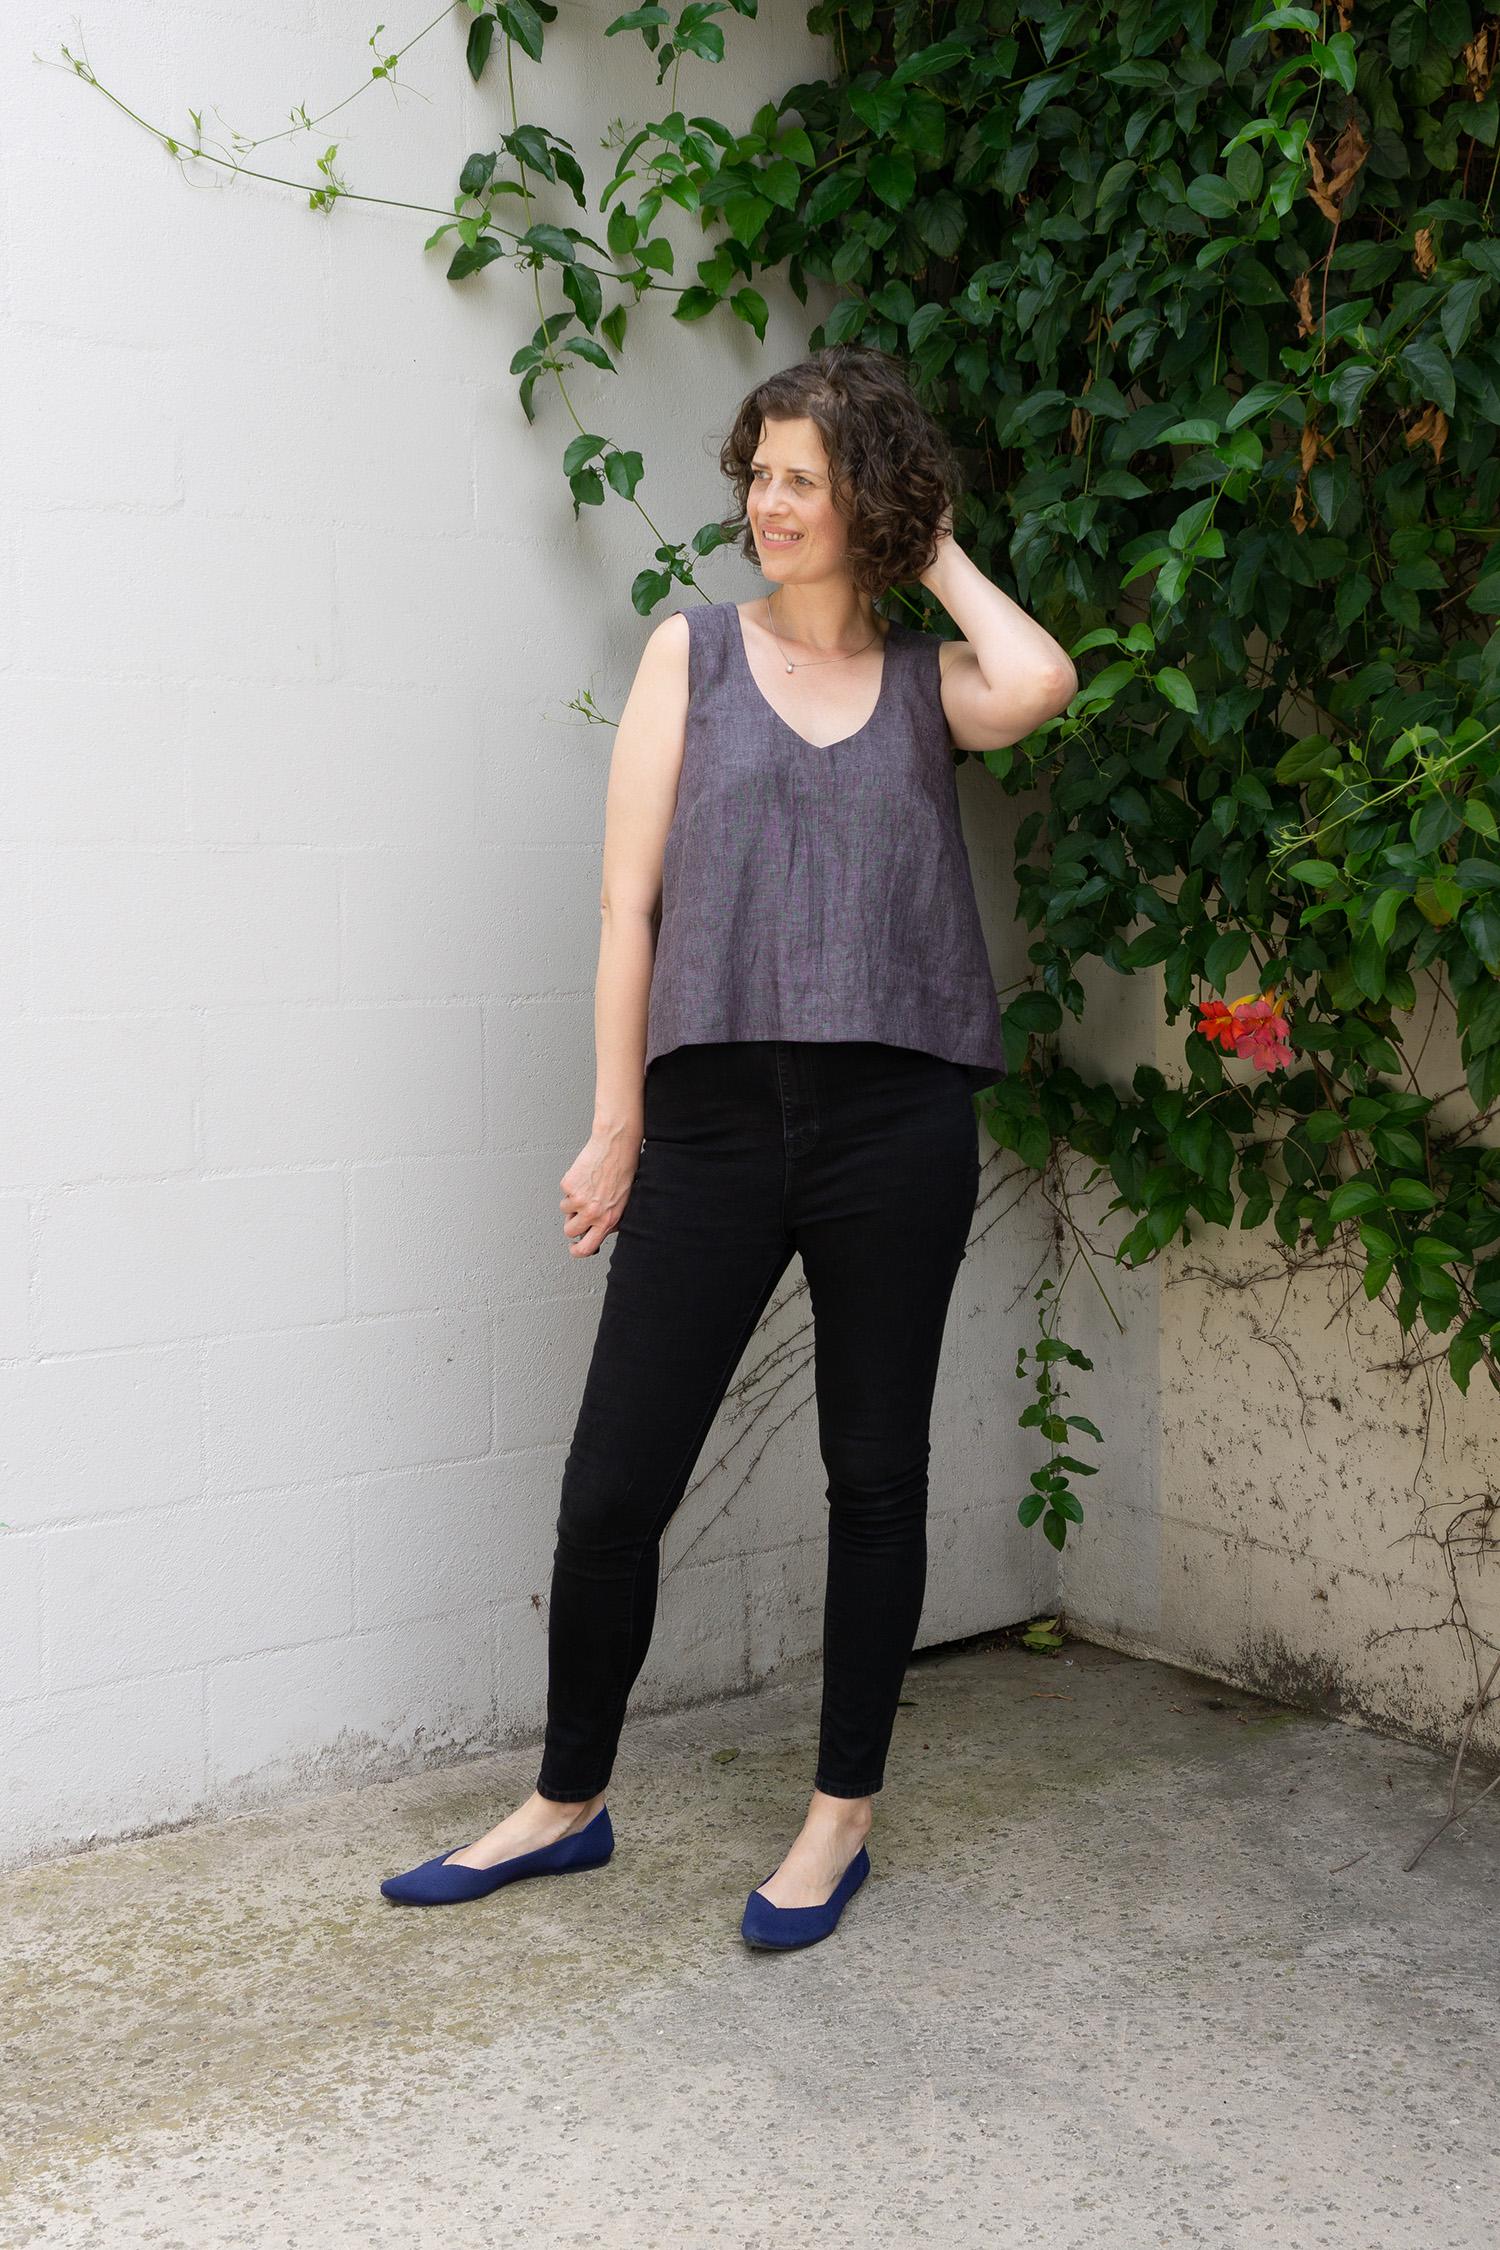 DIY Linen Swing Tank - Review of the Hadley Top by Grainline Studio - Sew DIY